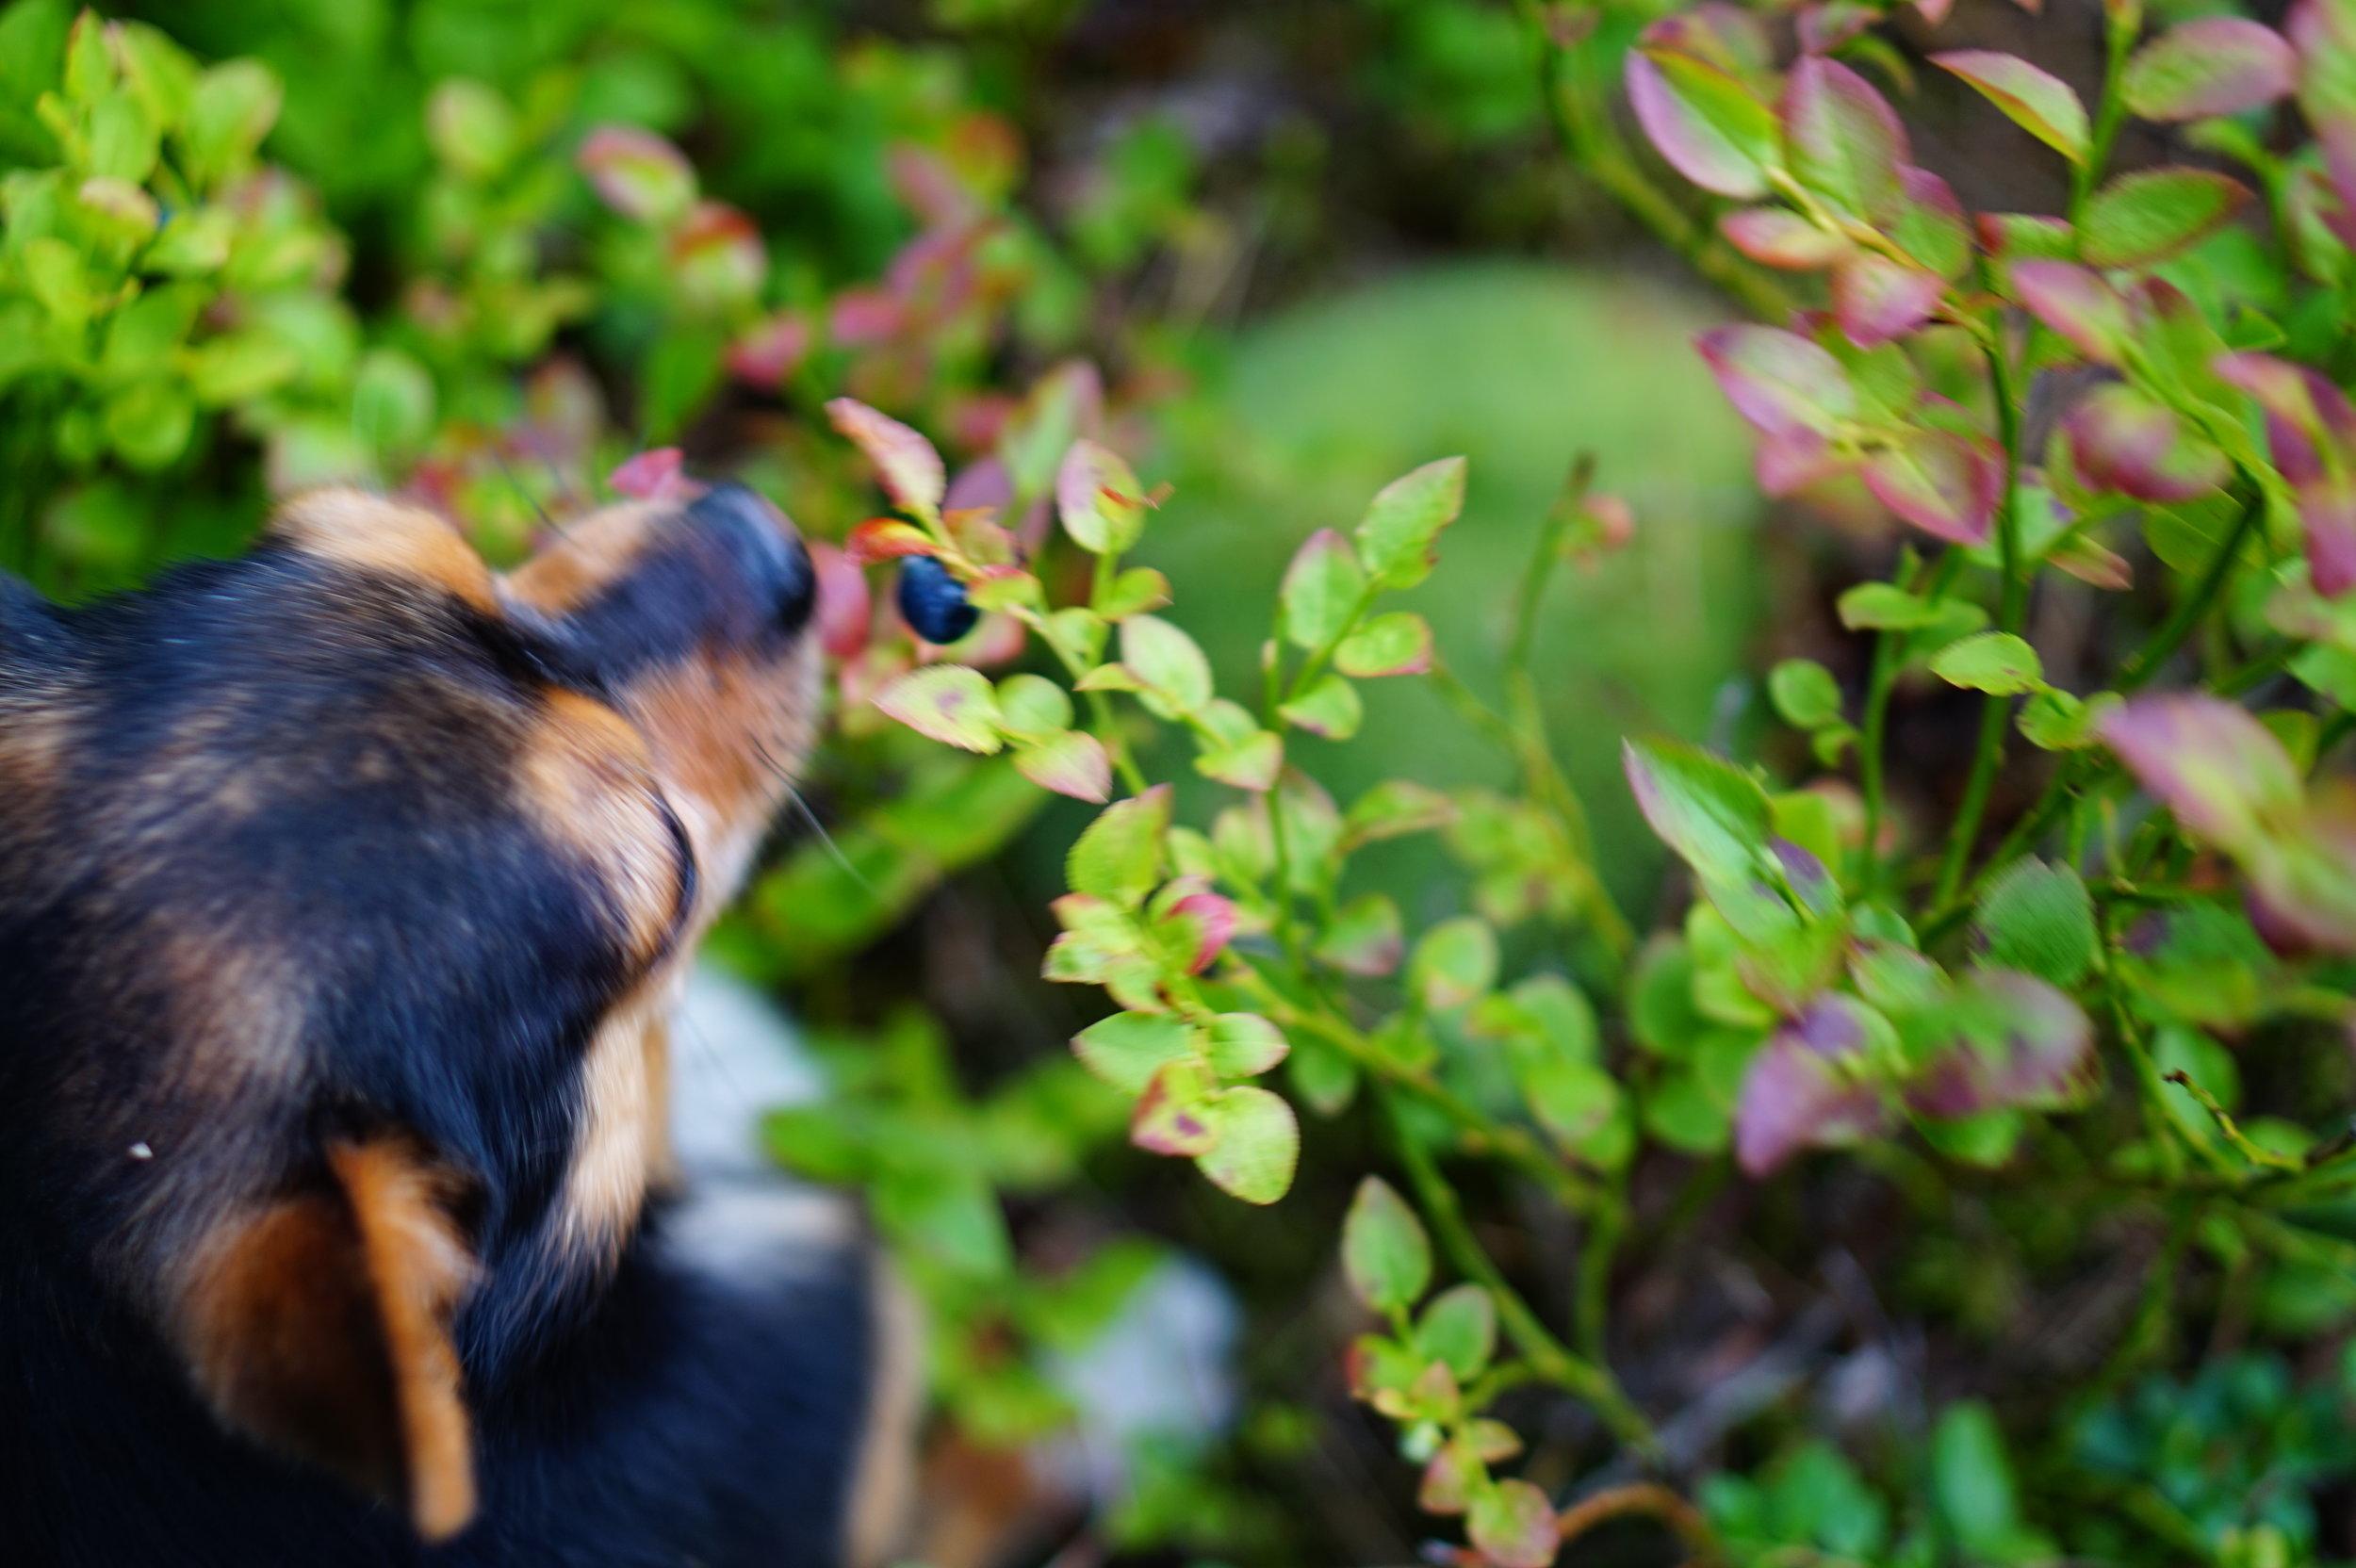 Samba (my dog) eating straight from the blueberry bush